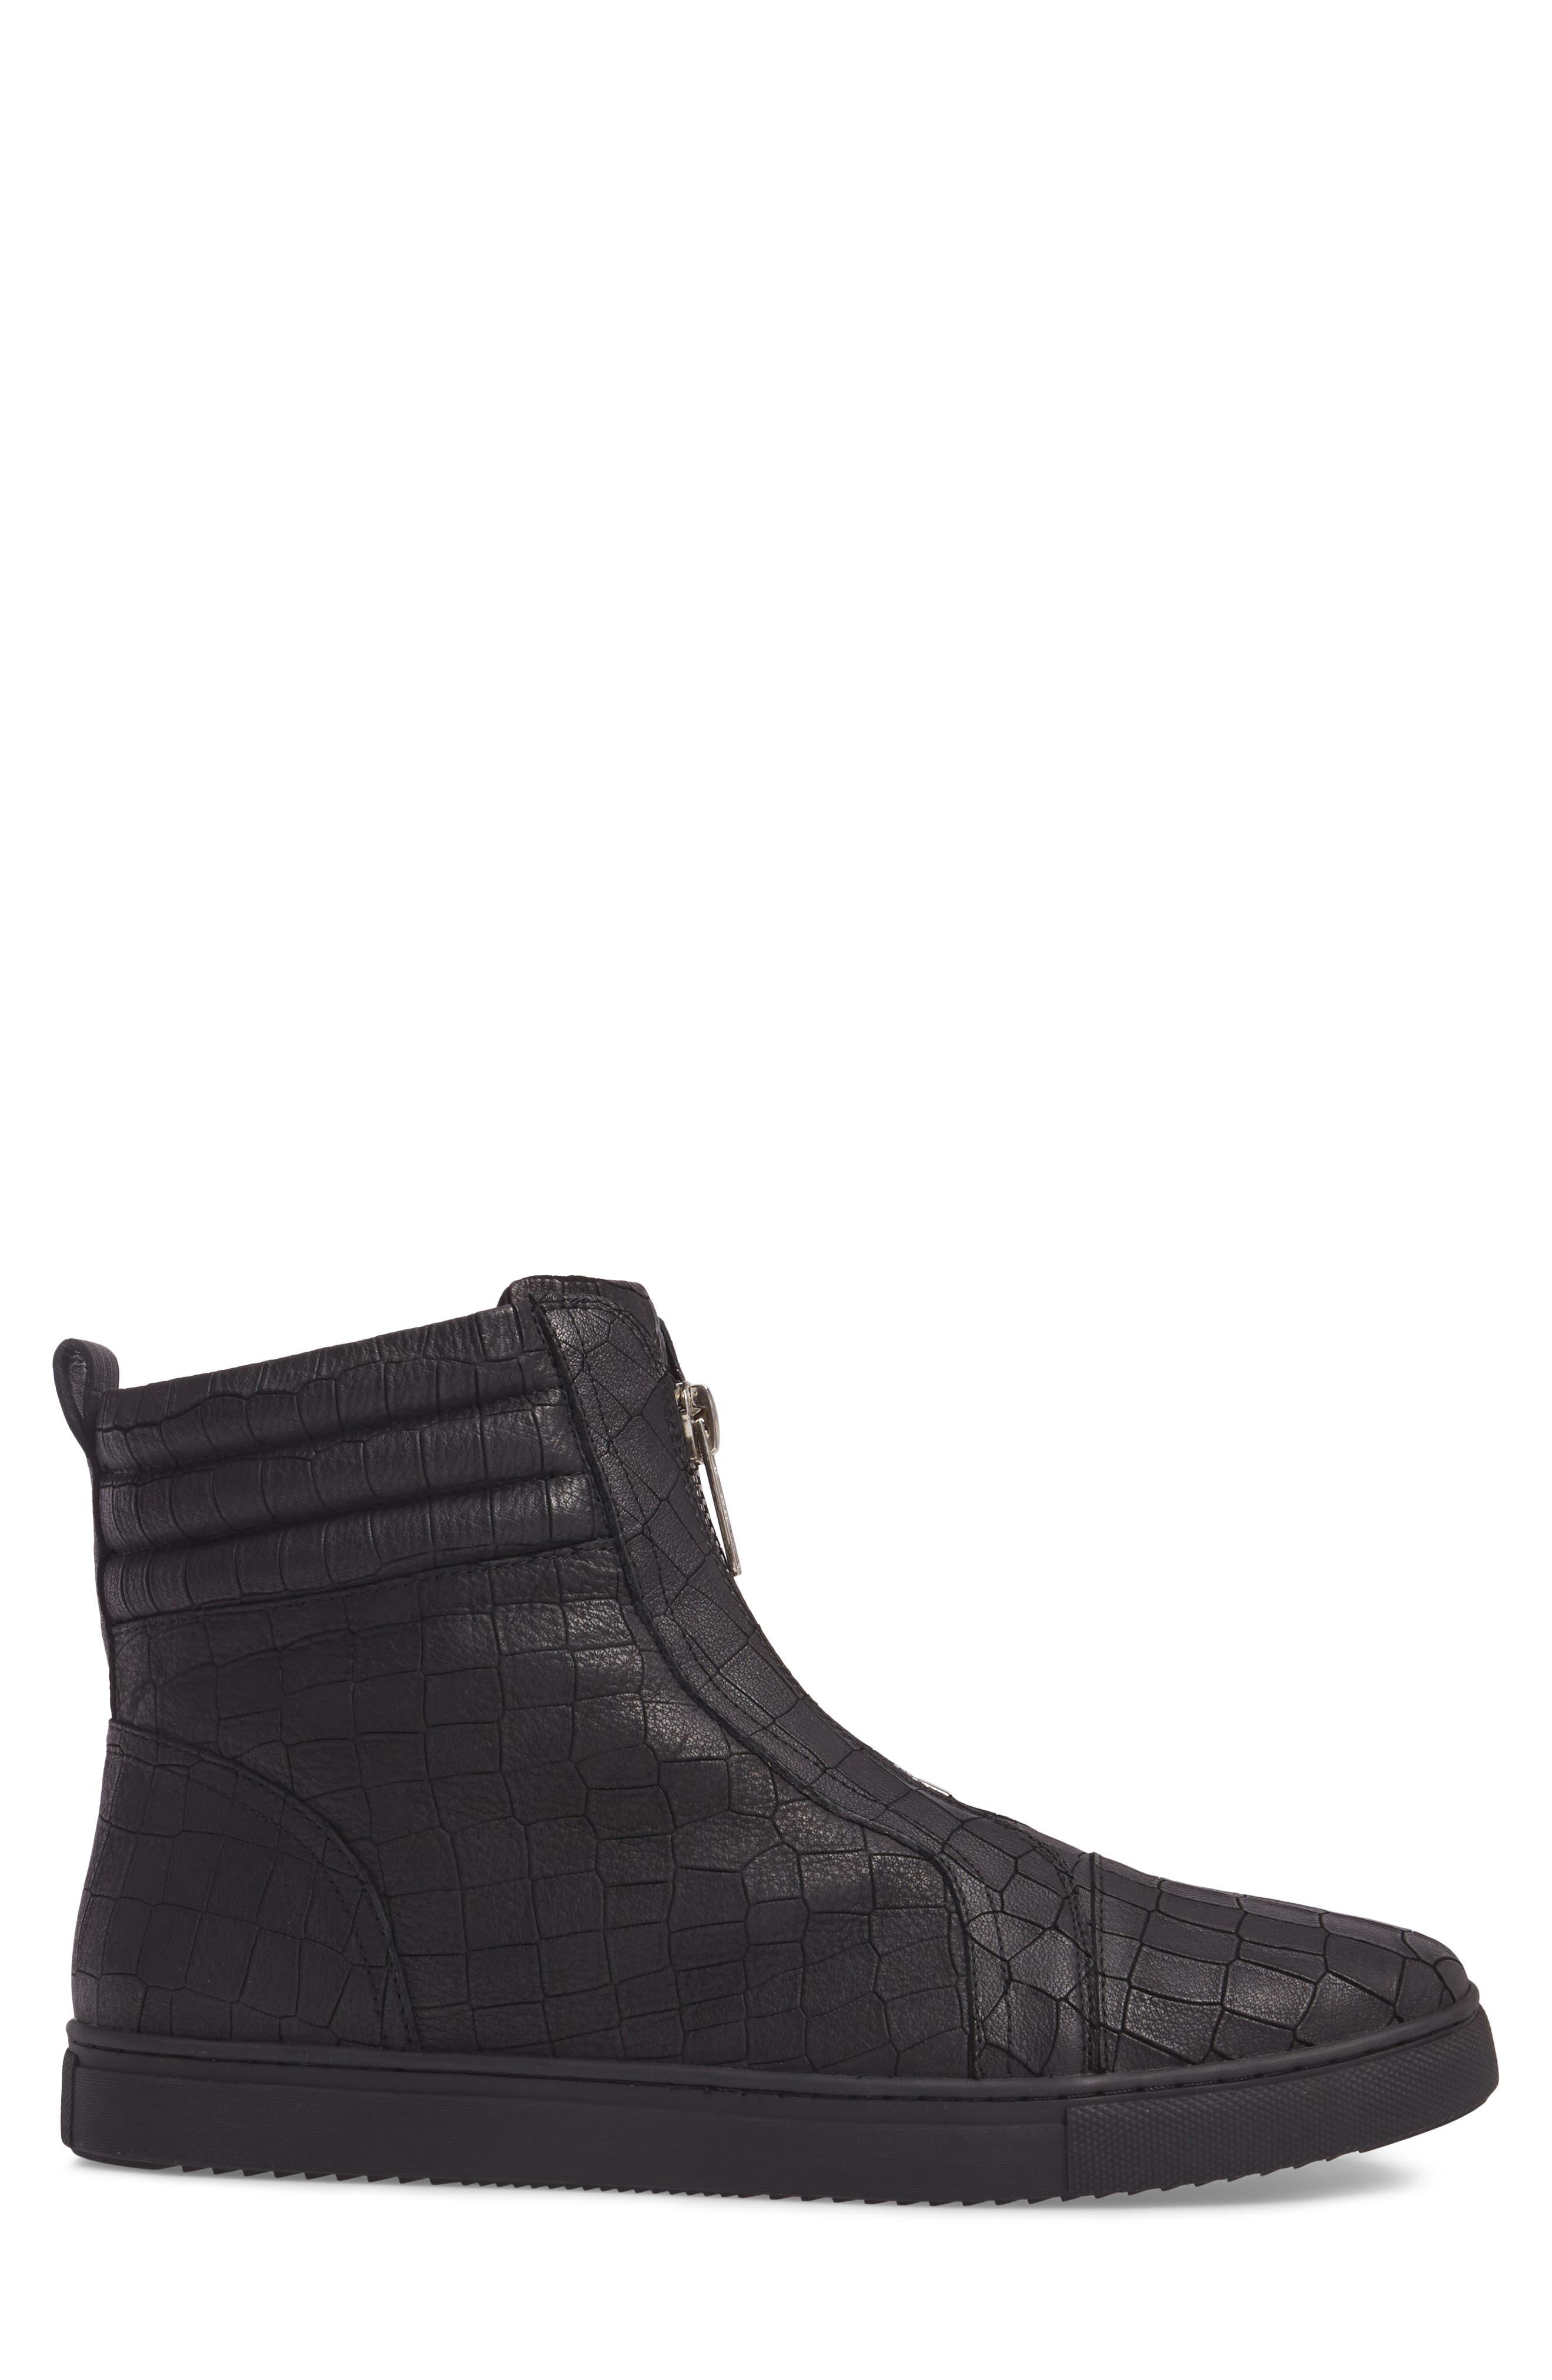 Hip & Bone Zip Boot,                             Alternate thumbnail 3, color,                             Black Croc Leather